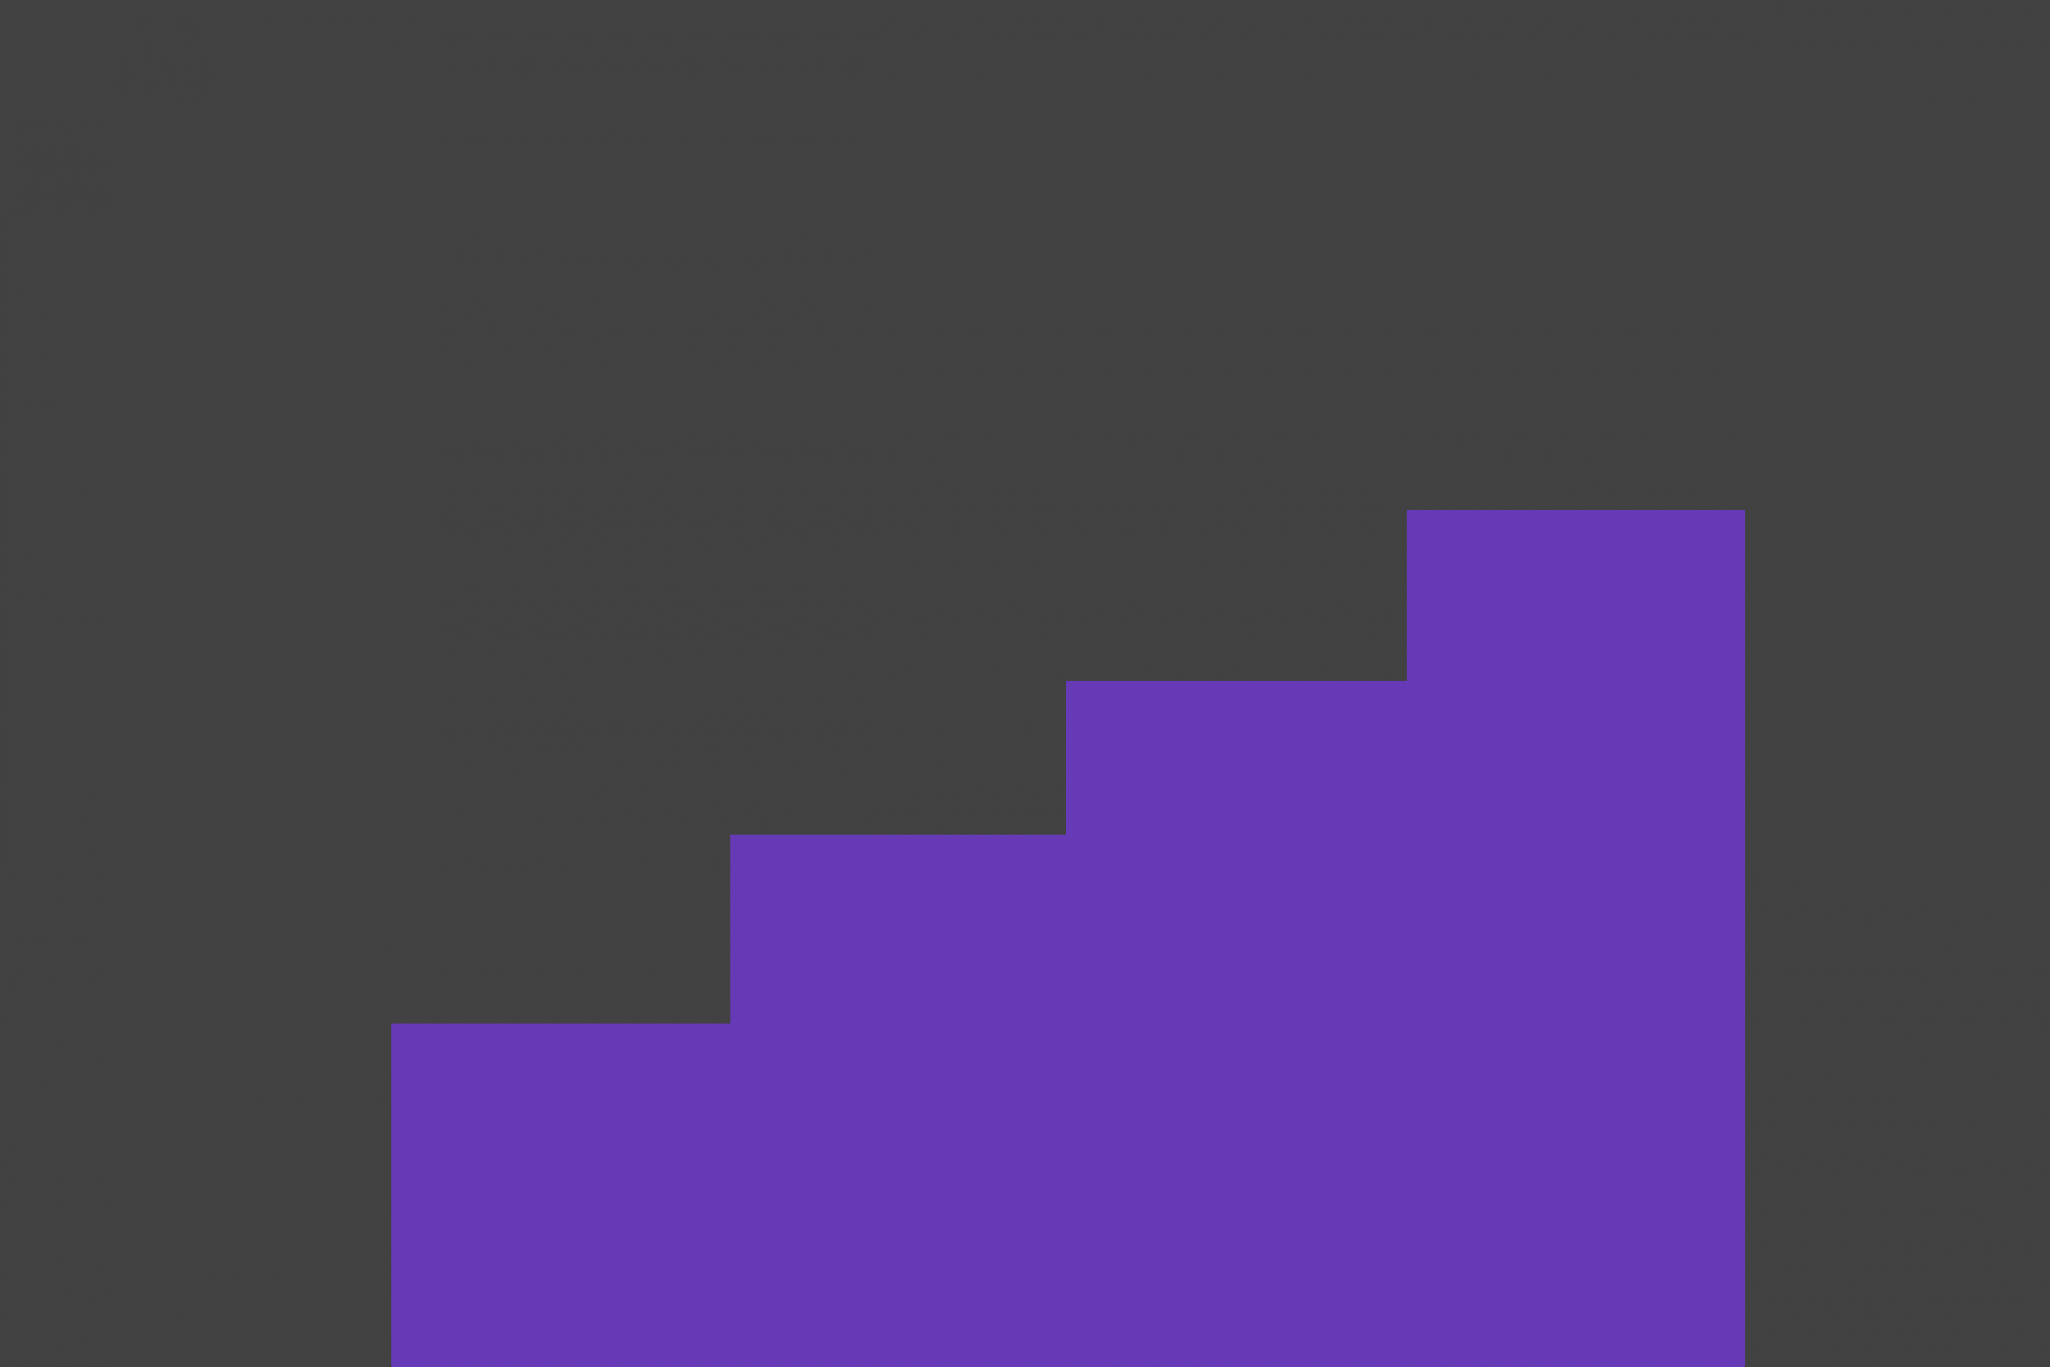 a progression bar